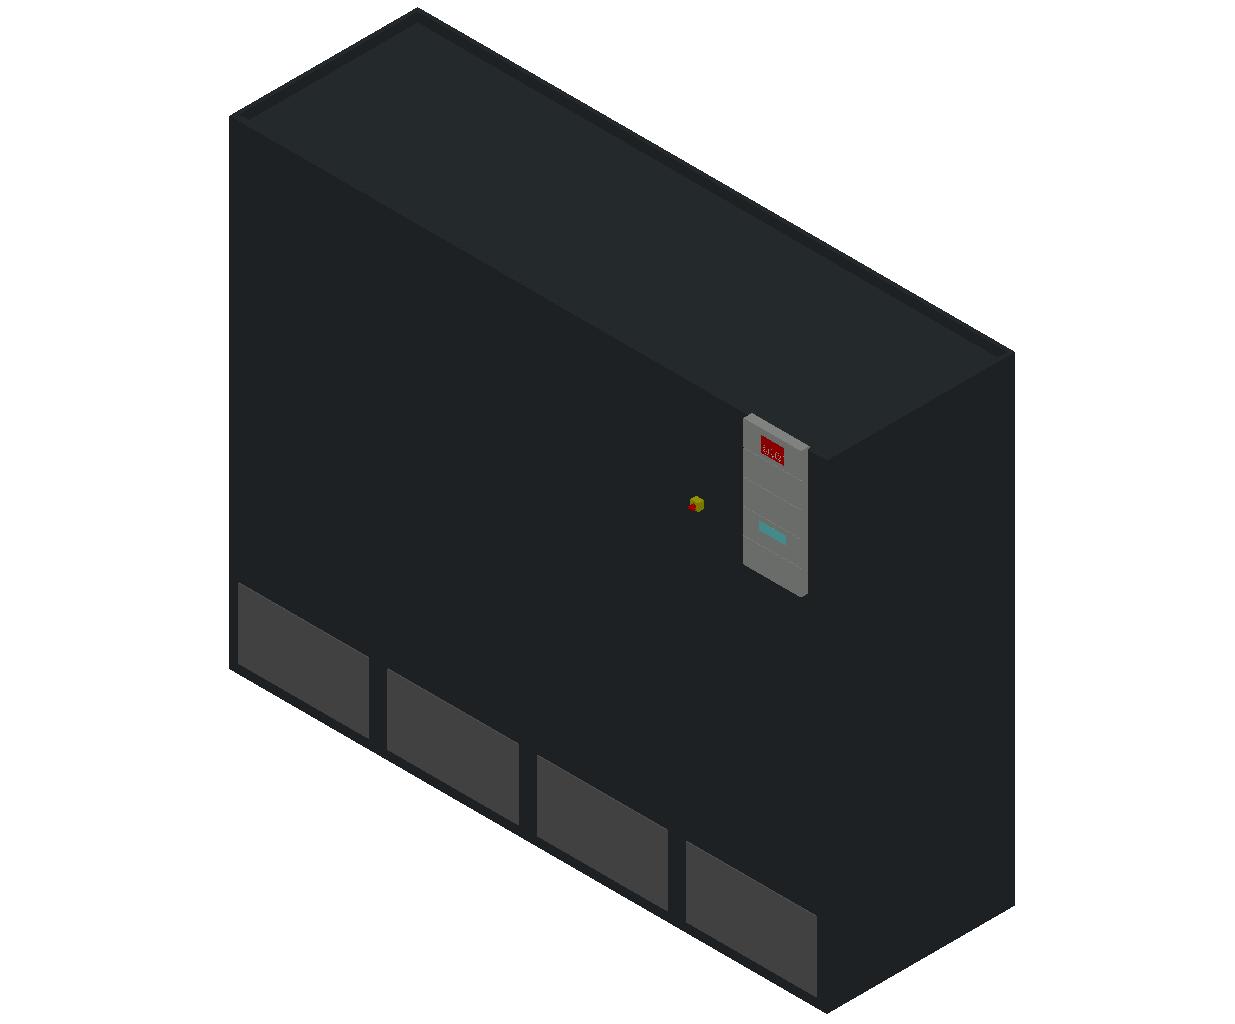 HC_Air Conditioner_Indoor Unit_MEPcontent_STULZ_CyberAir 3PRO_ASR_CW2_ASR_1960_CW2_INT-EN.dwg